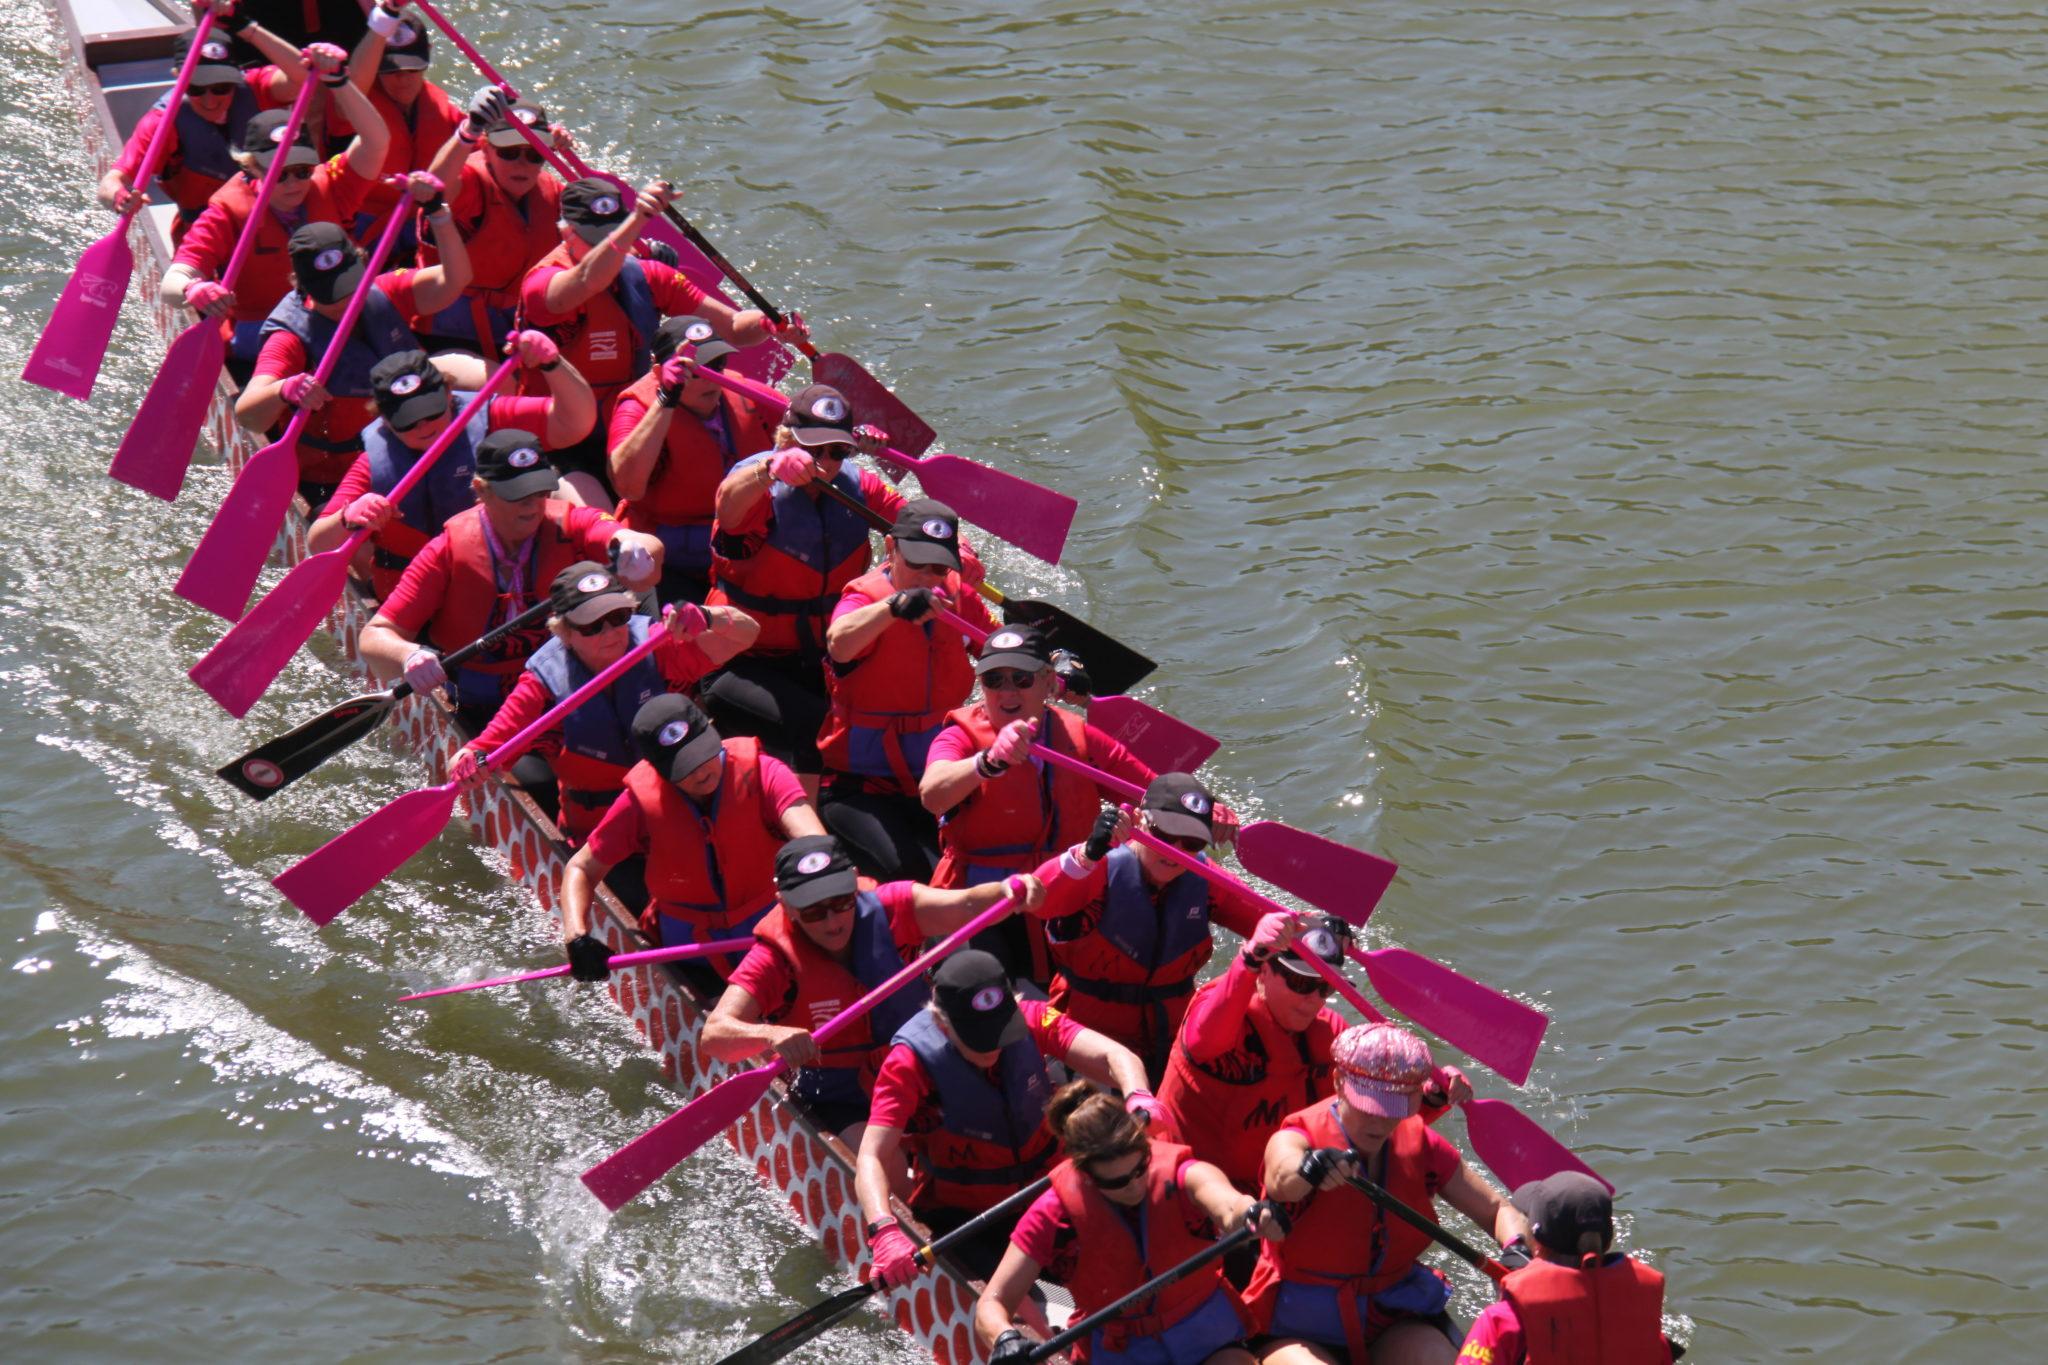 dragons_abreast_brisbane_MBT_dragon_boat_paddling_for_breast_cancer